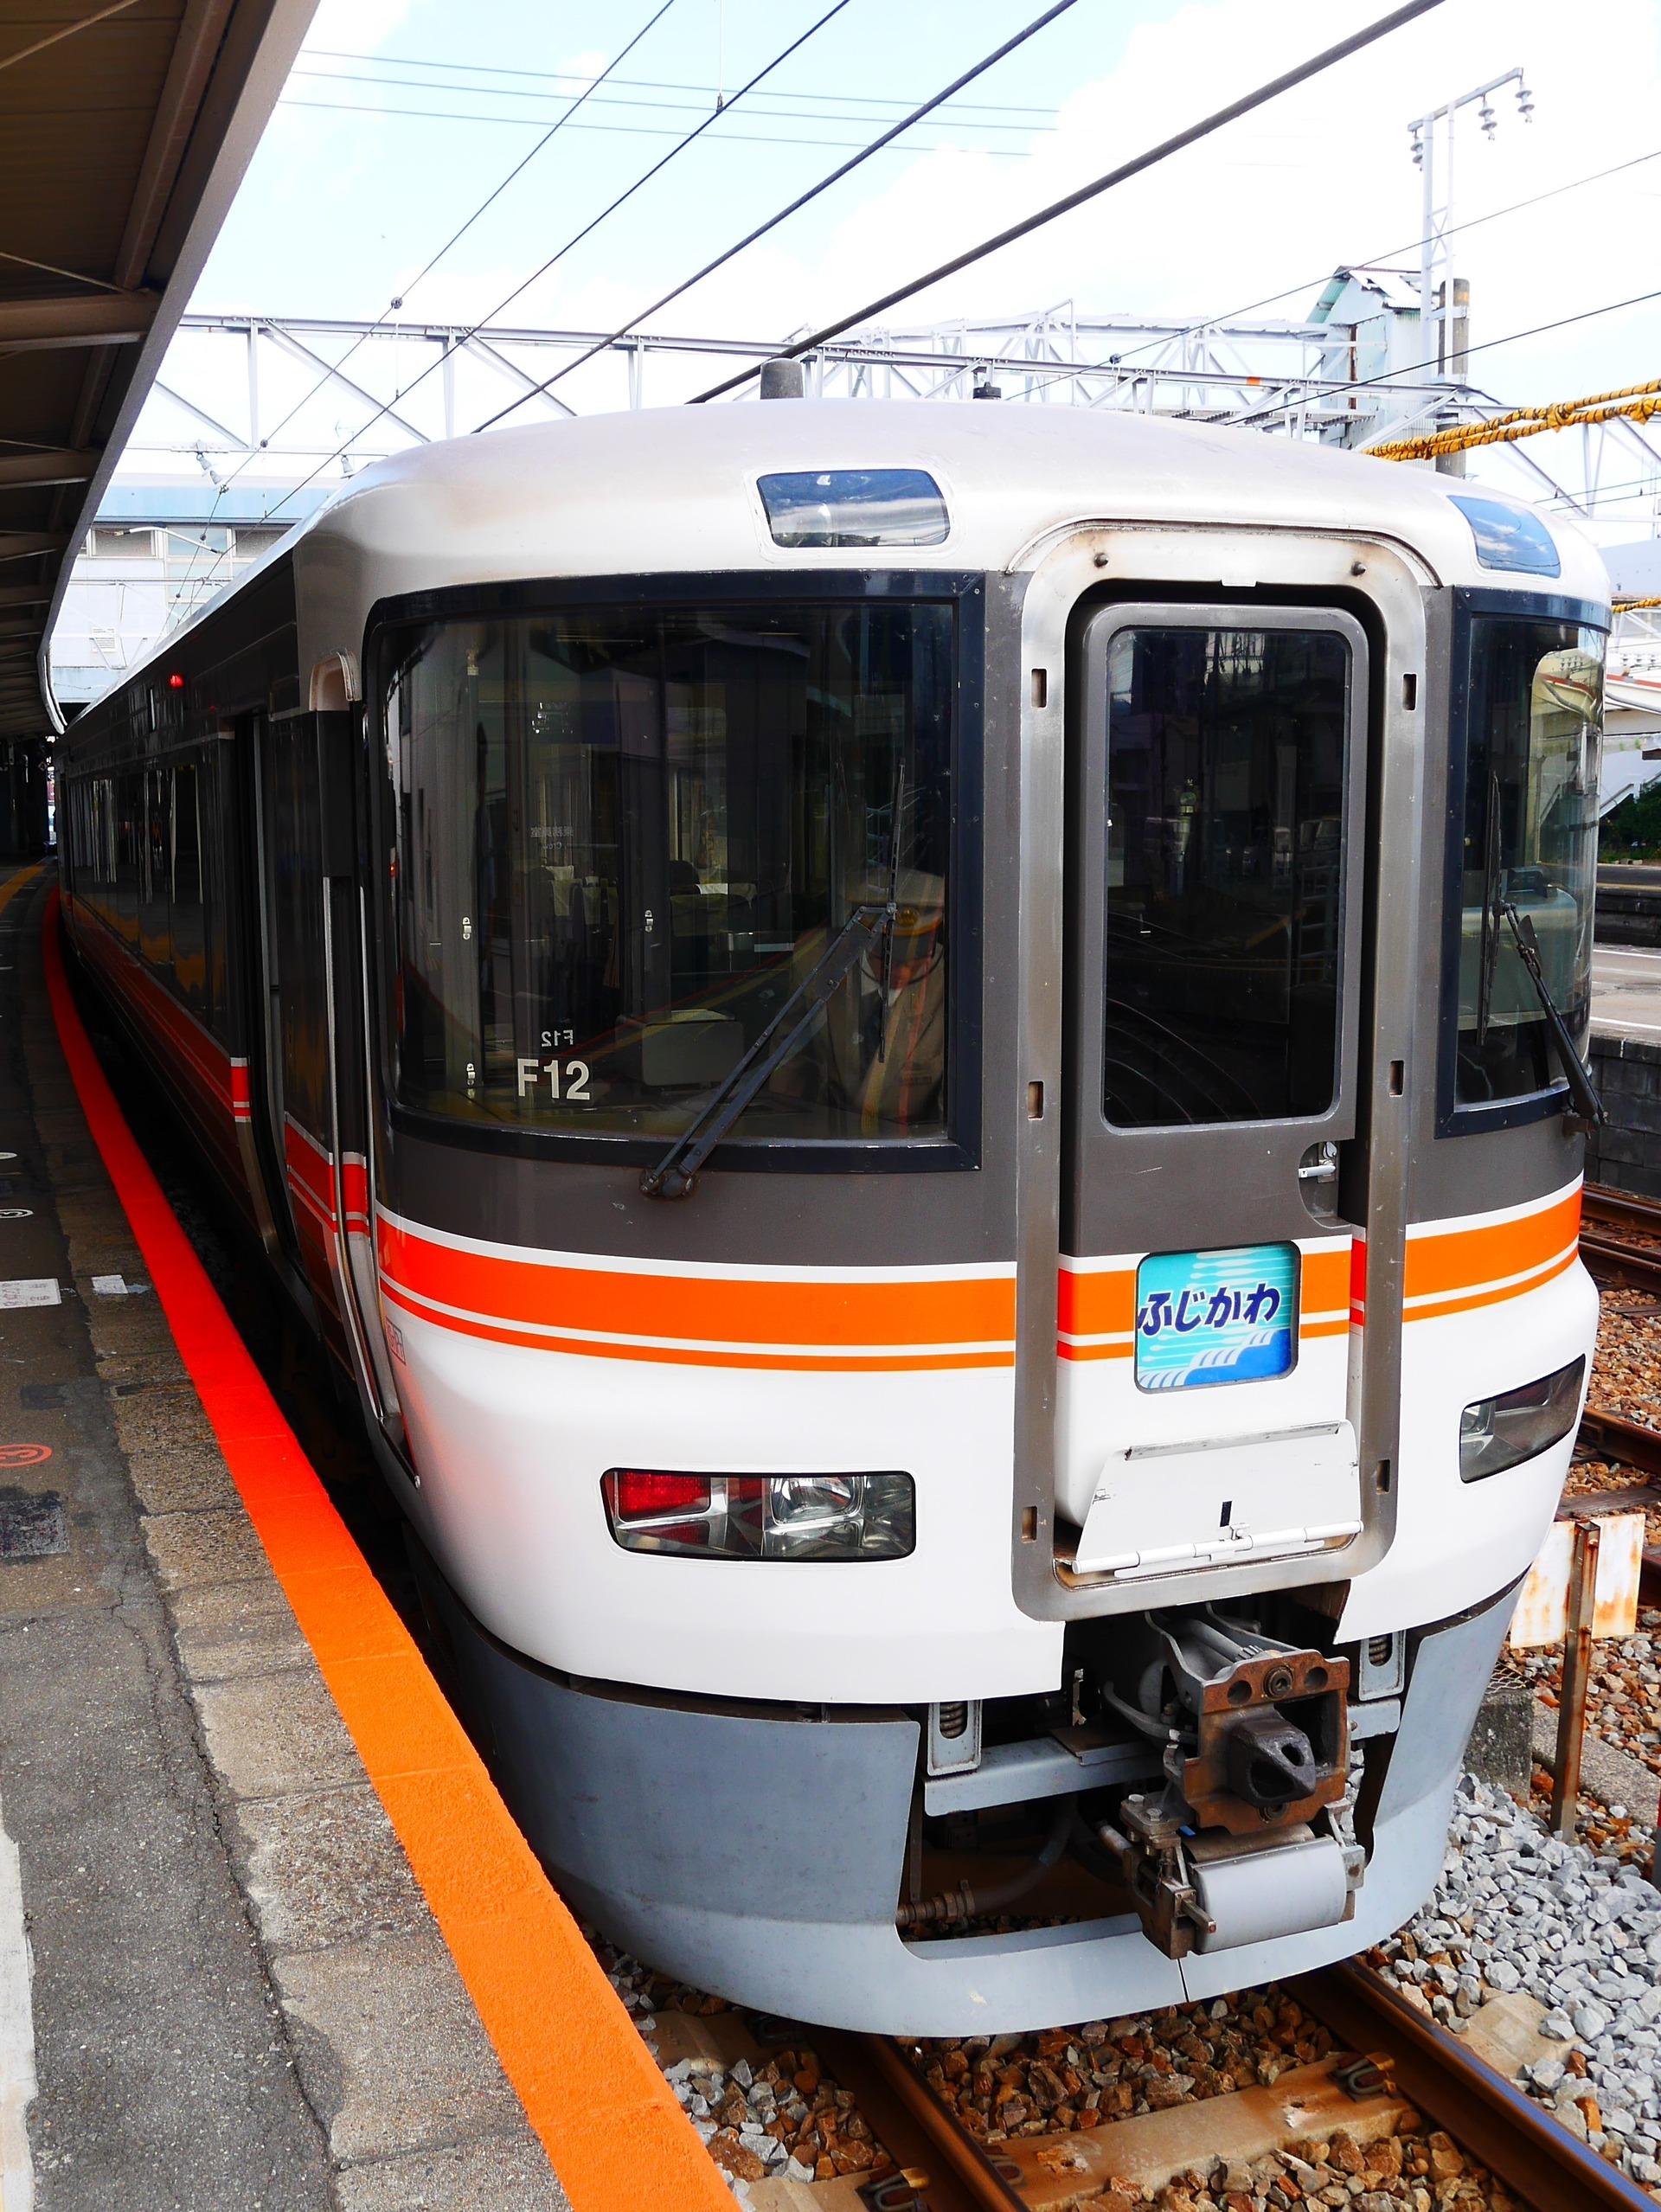 P1070361 (3)